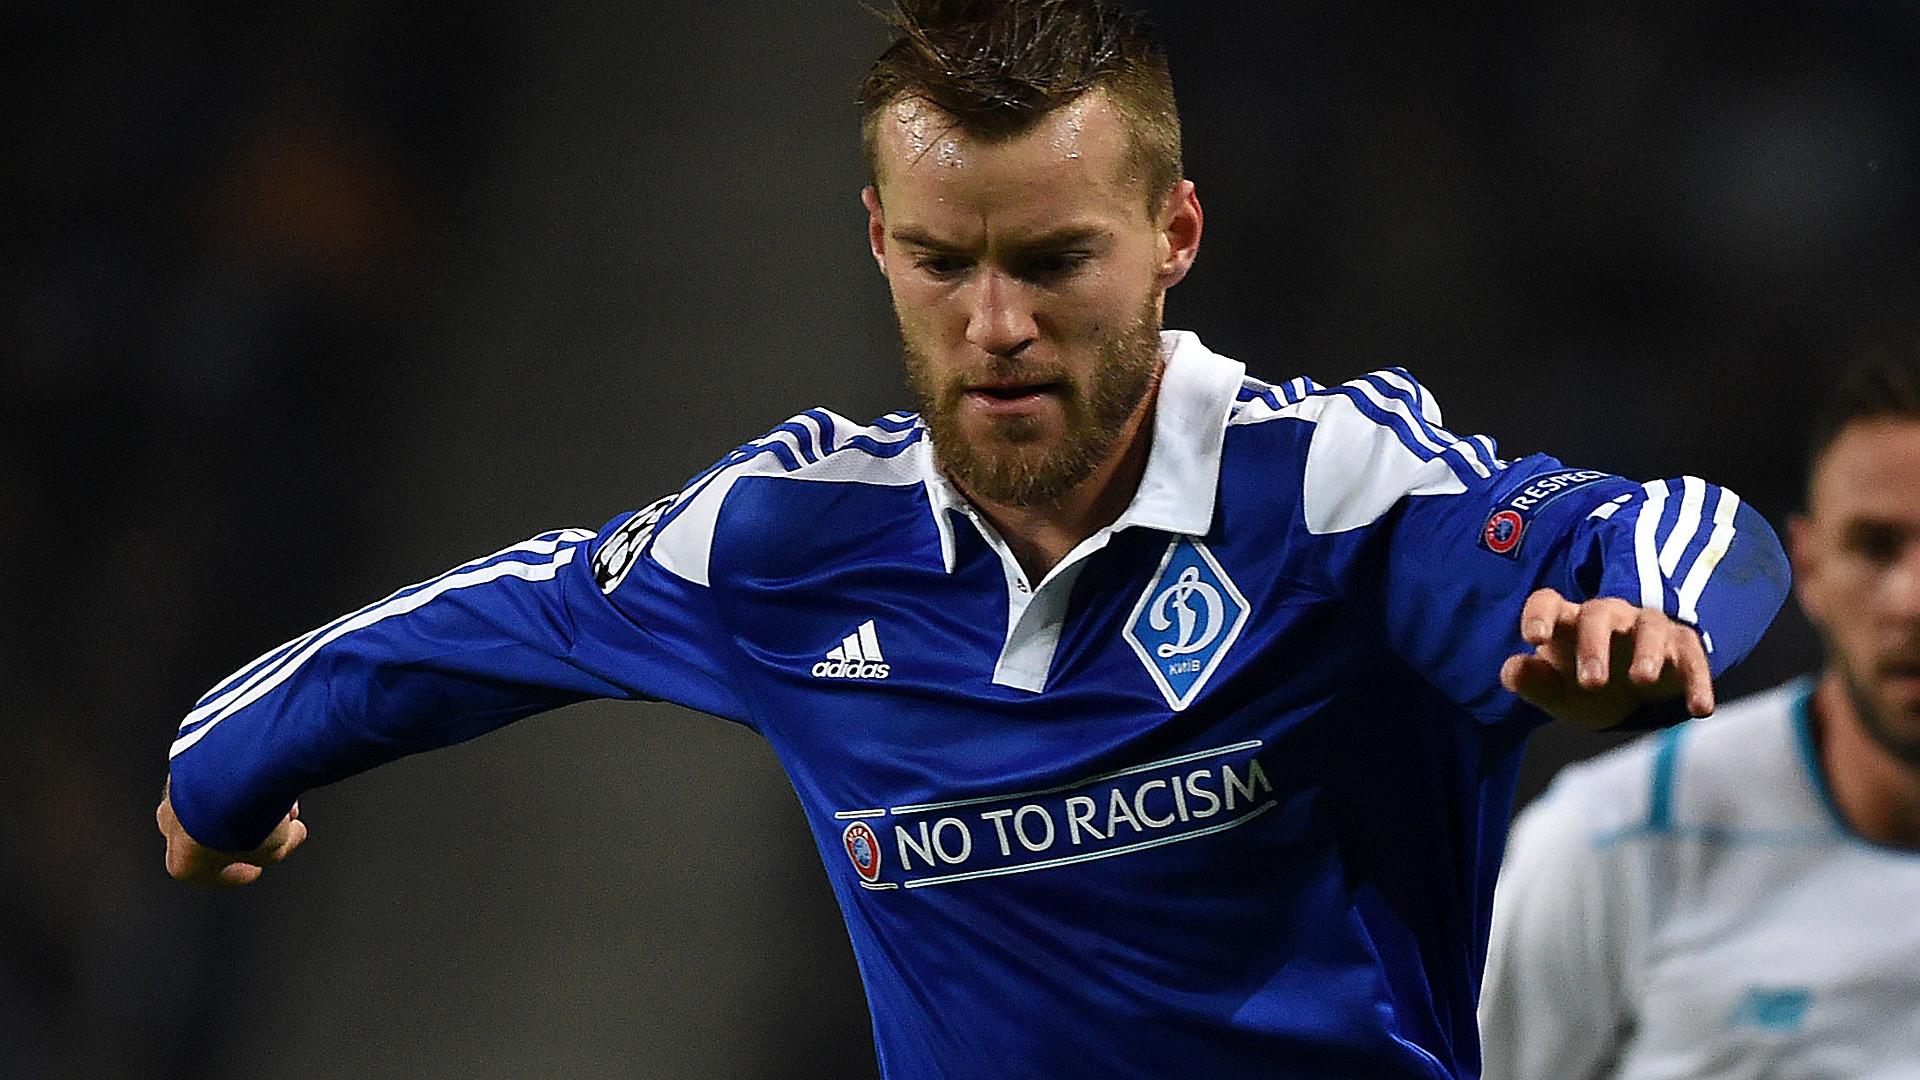 Andrei Yarmolenko (Dynamo Kiev) à Dortmund contre 25M€